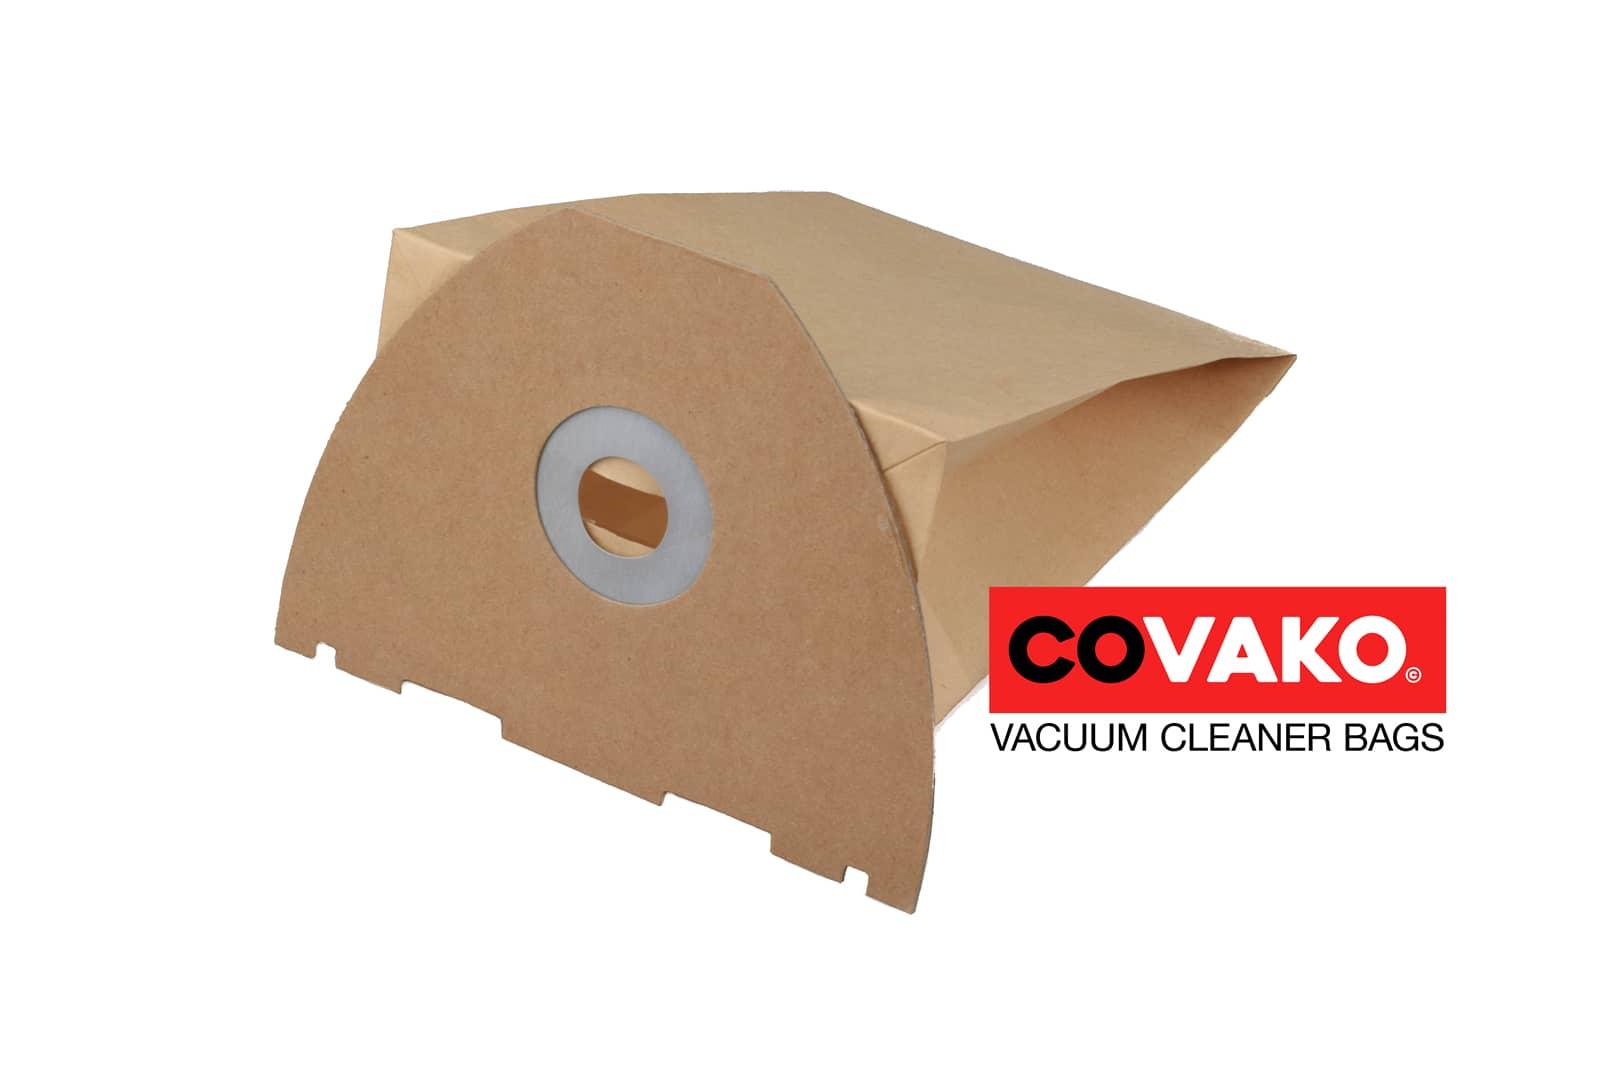 Wap UZ 964 / Papier - Wap stofzuigerzakken